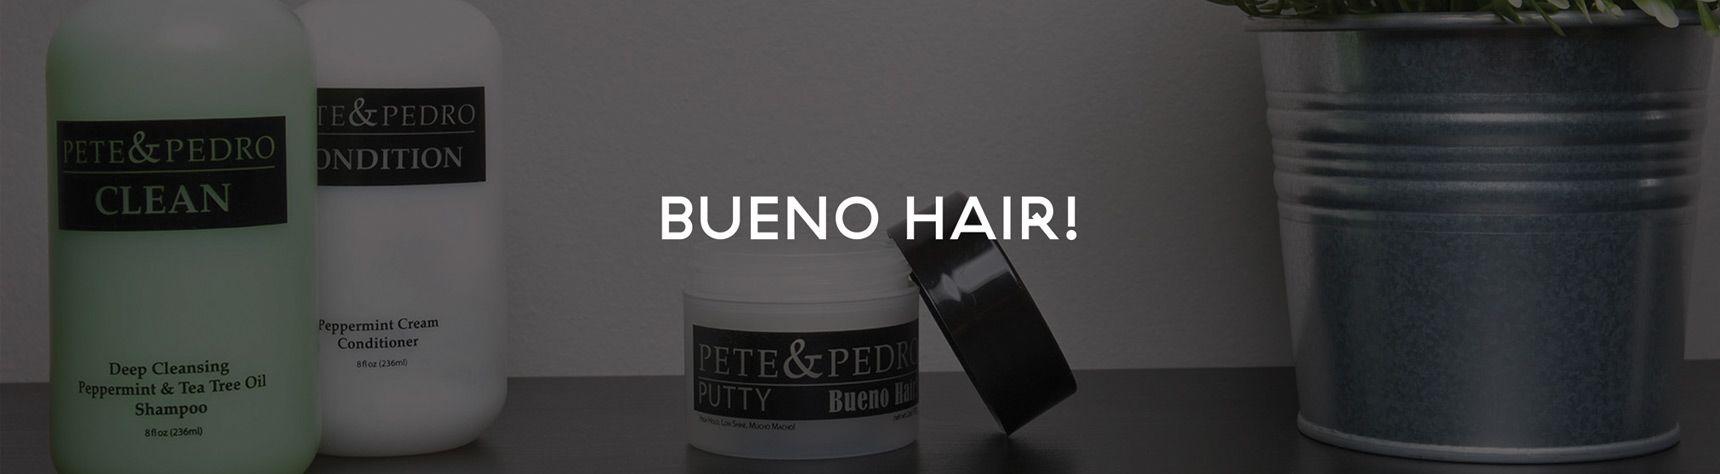 Pete and Pedro Bueno Hair